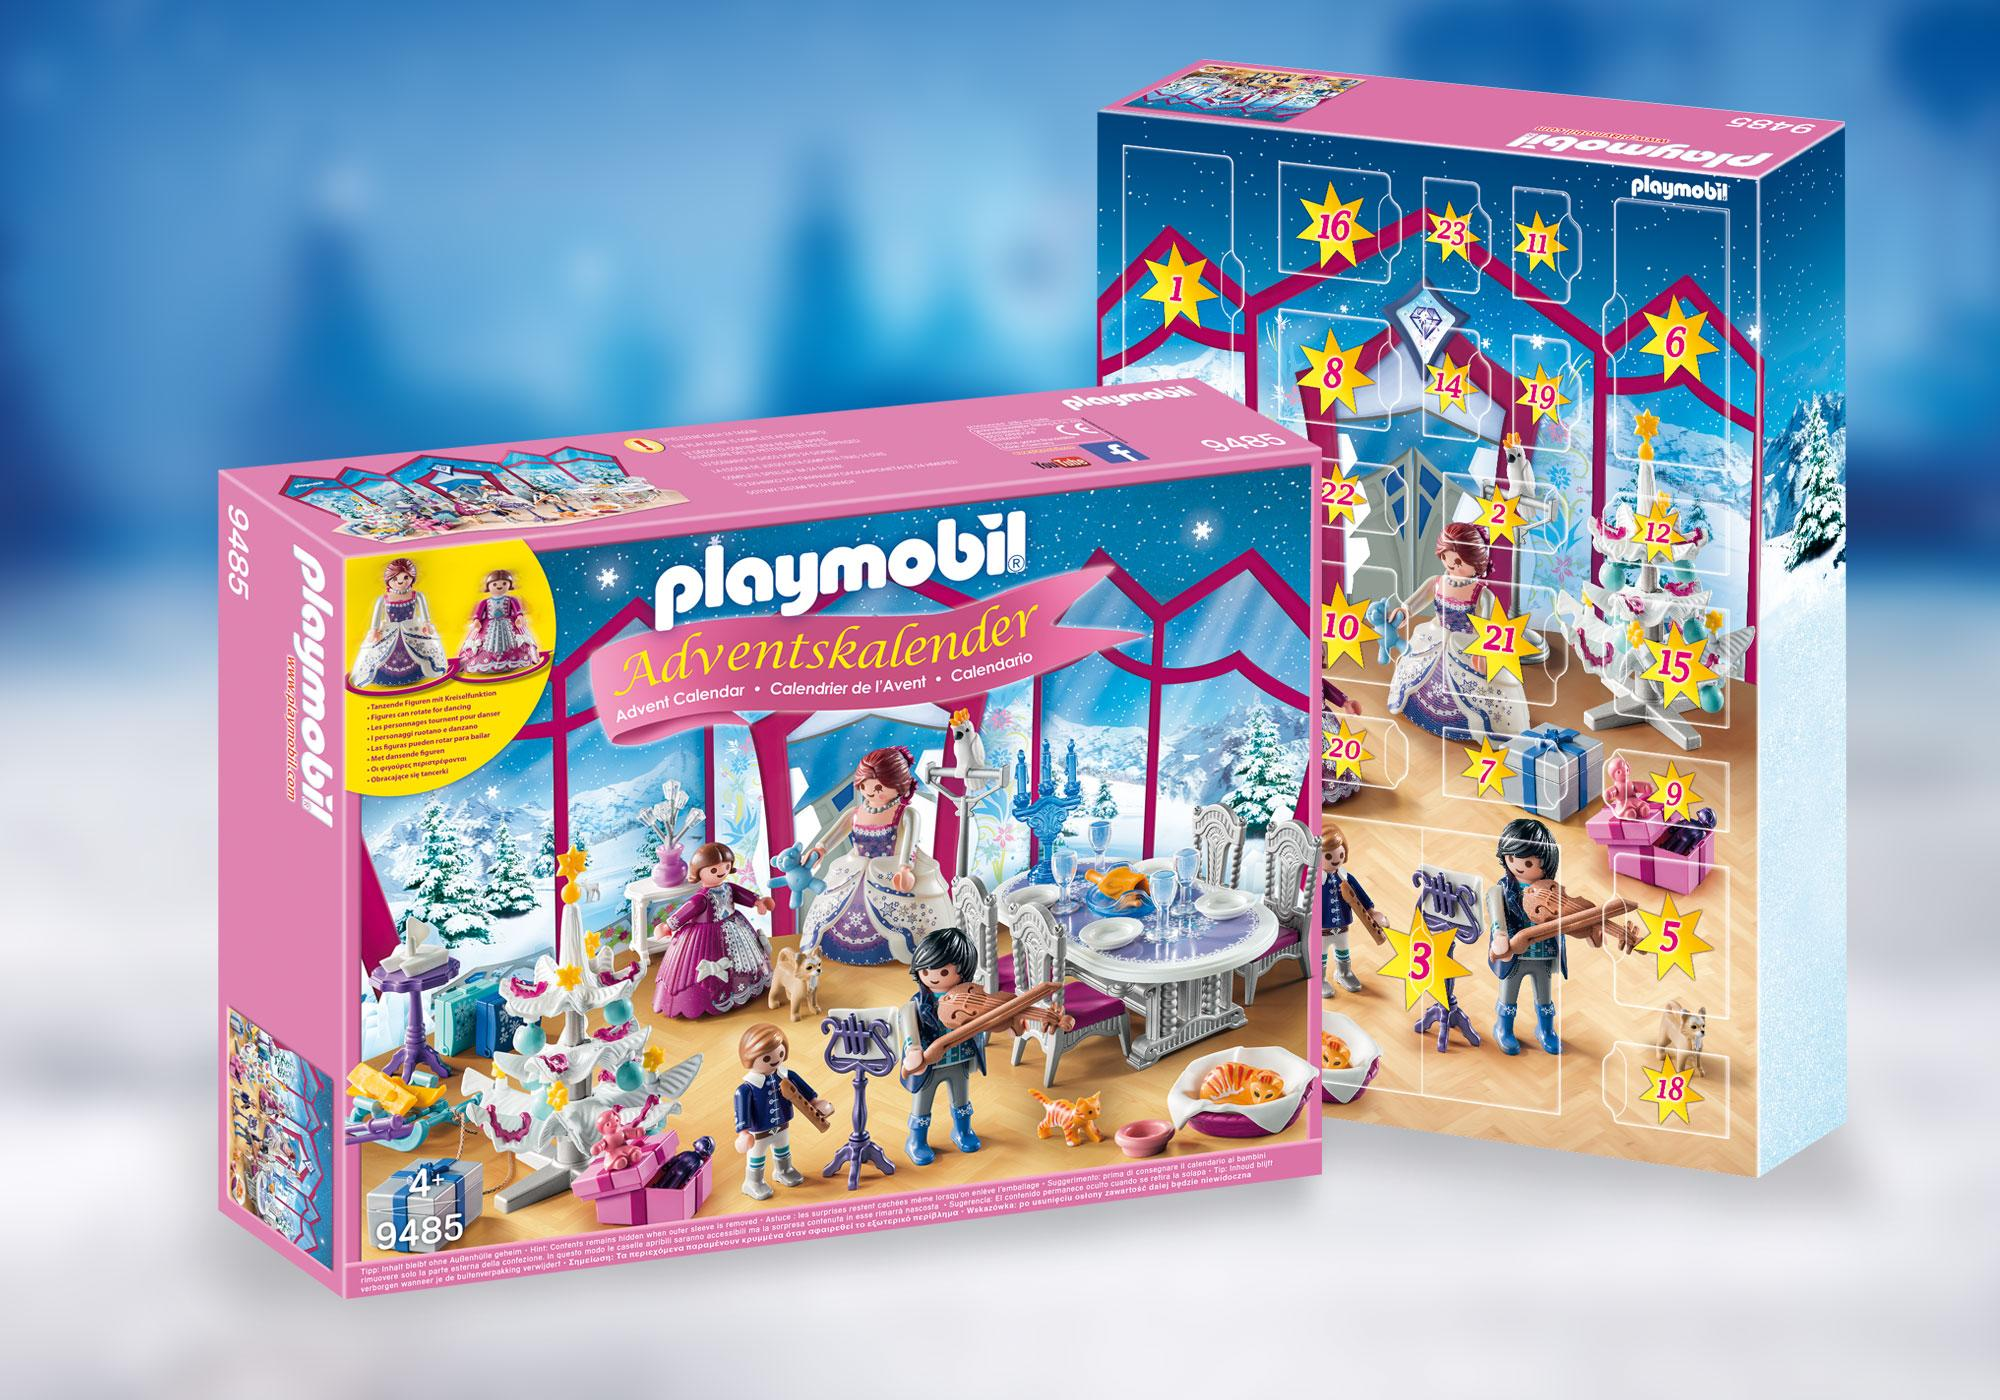 http://media.playmobil.com/i/playmobil/9485_product_detail/Adventskalender 'Kerstfeest in het kristallen salon'